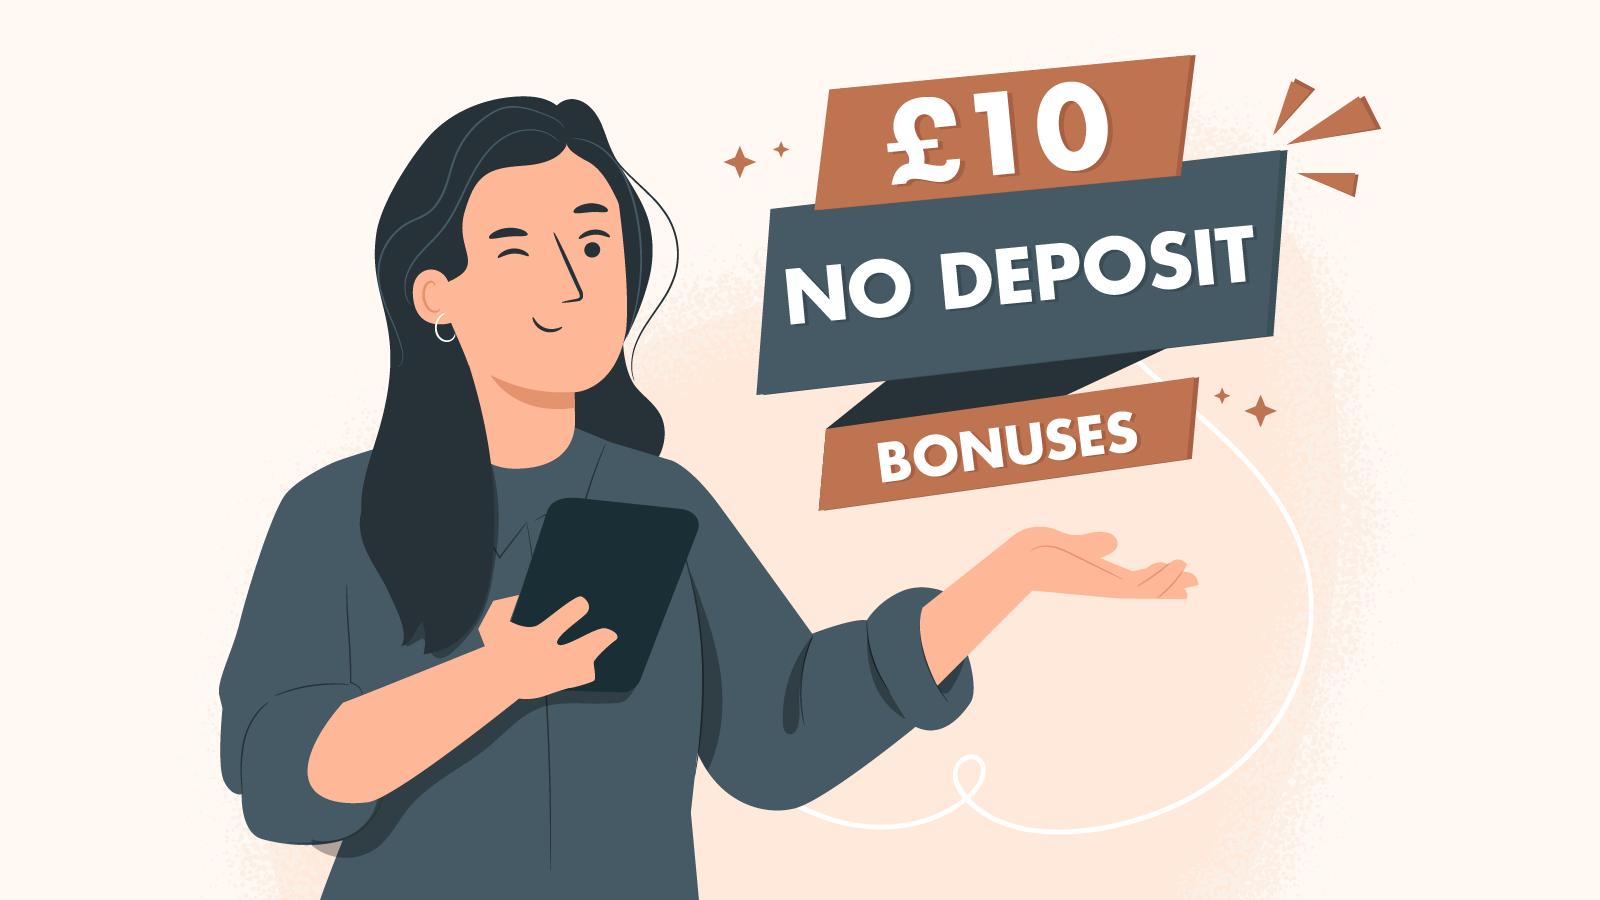 £10 No Deposit Bonuses in the United Kingdom